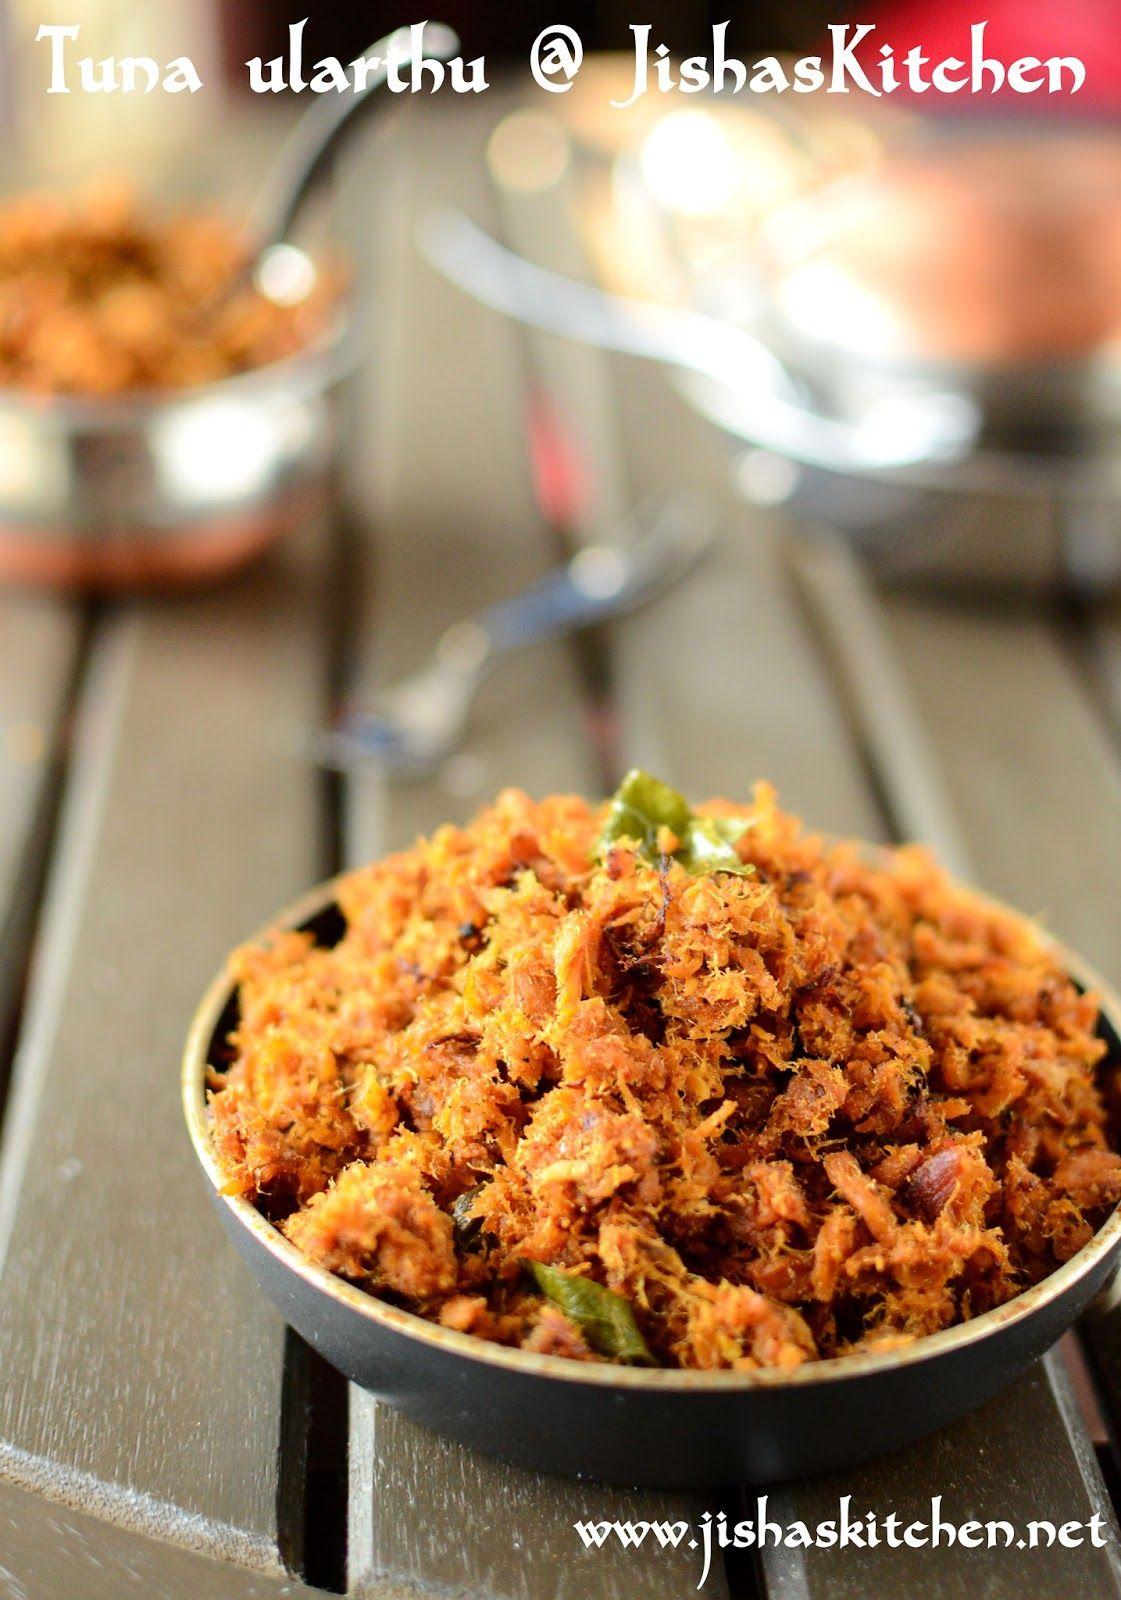 Jisha S Kitchen Kerala Style Canned Tuna Ularthu Indian